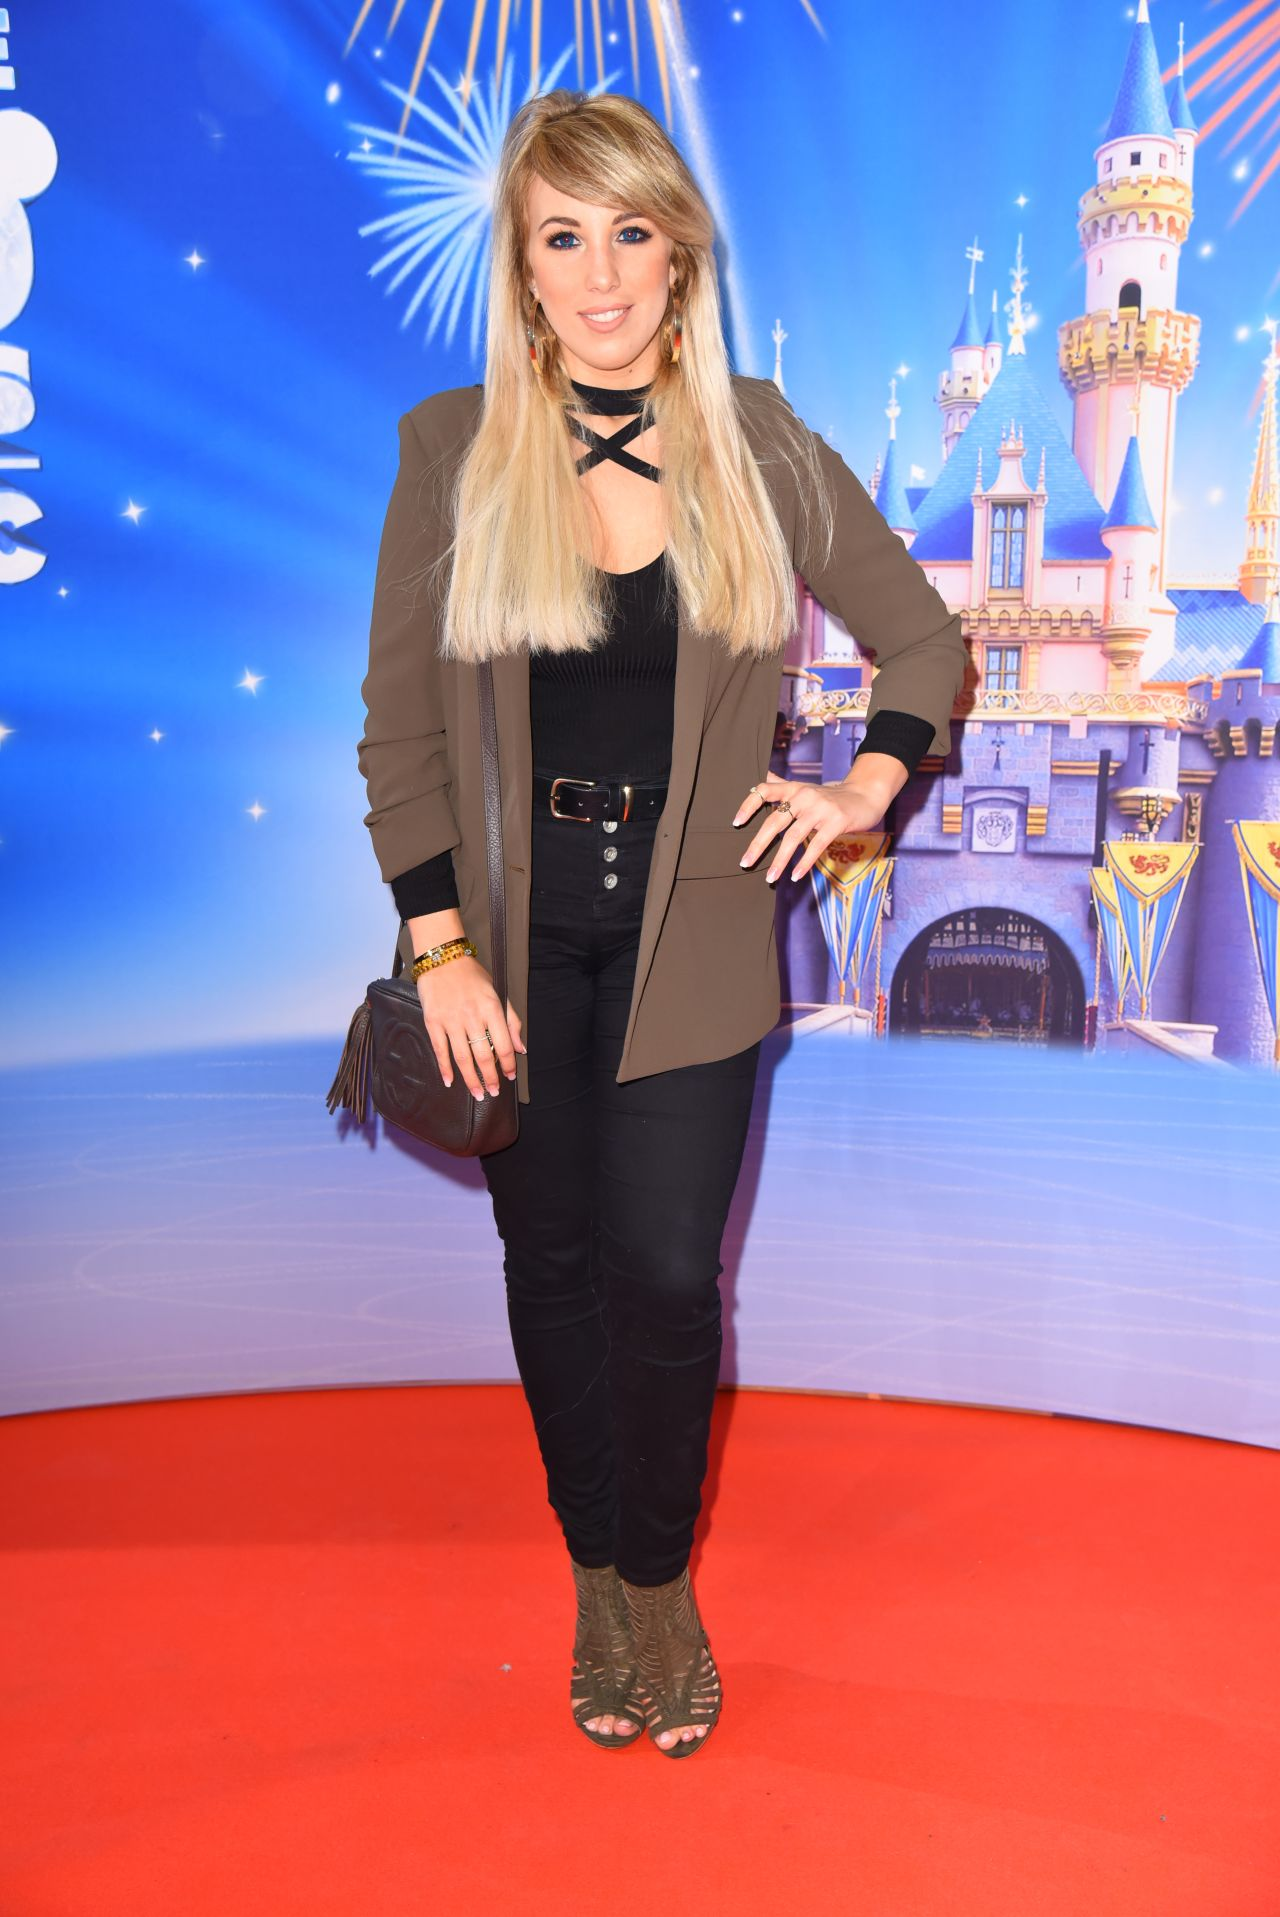 Annemarie Eilfeld at 'Disney on Ice' Premiere in Velodrom, Berlin 3/2/ 2017